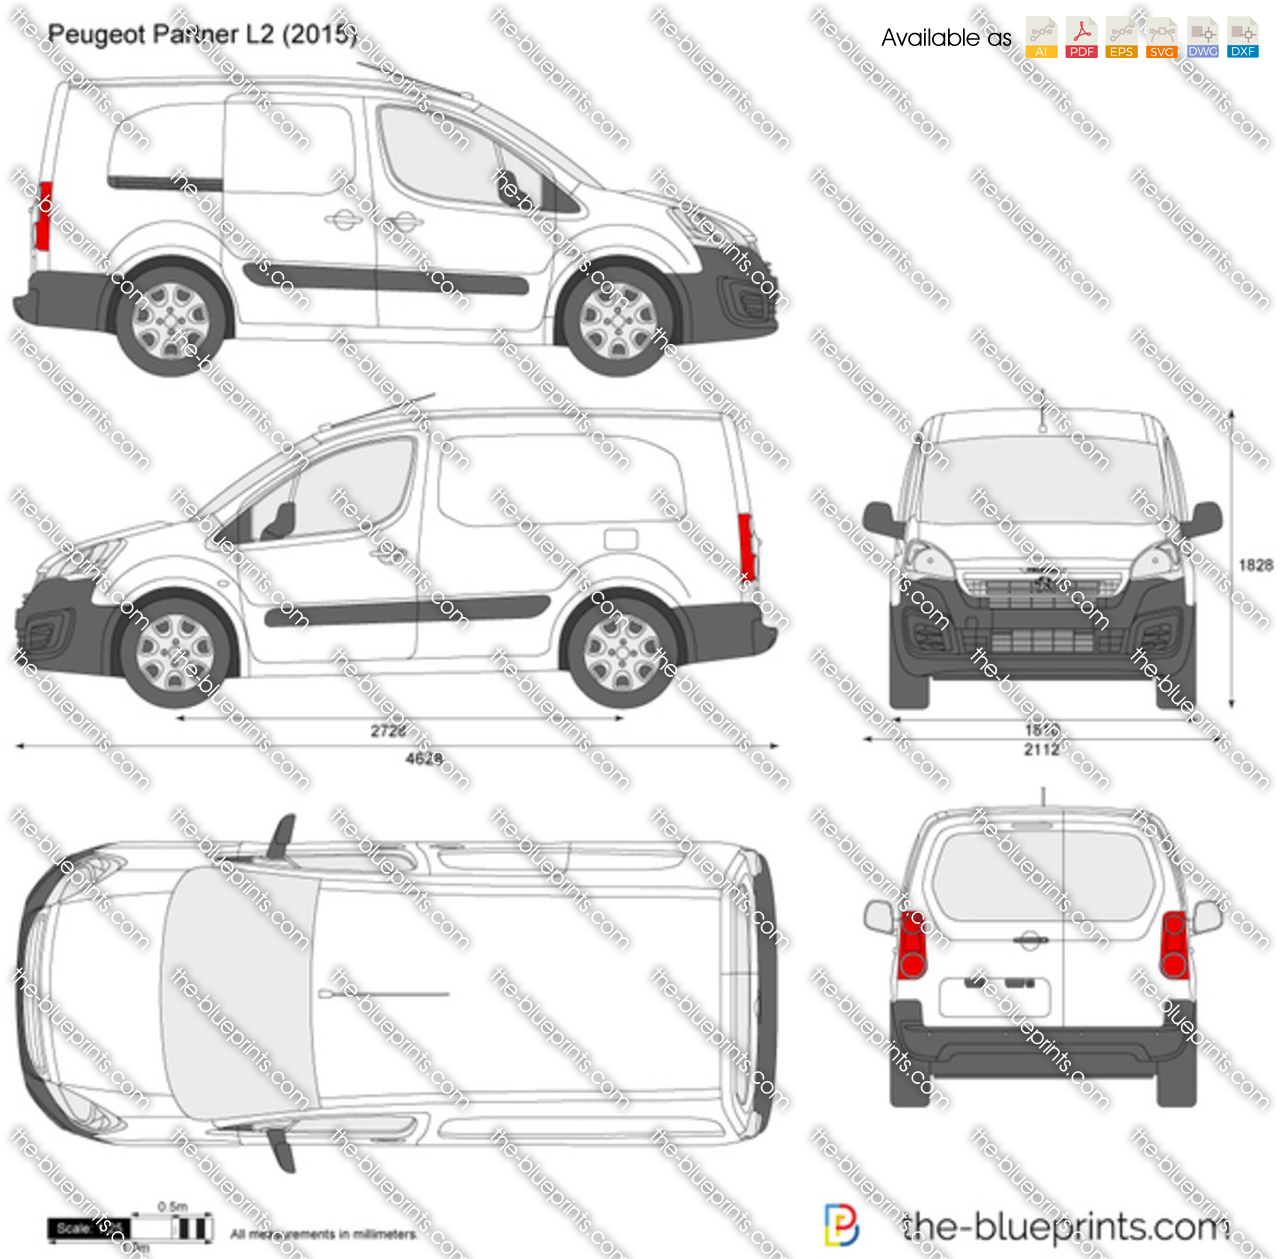 Peugeot Partner L2 2016